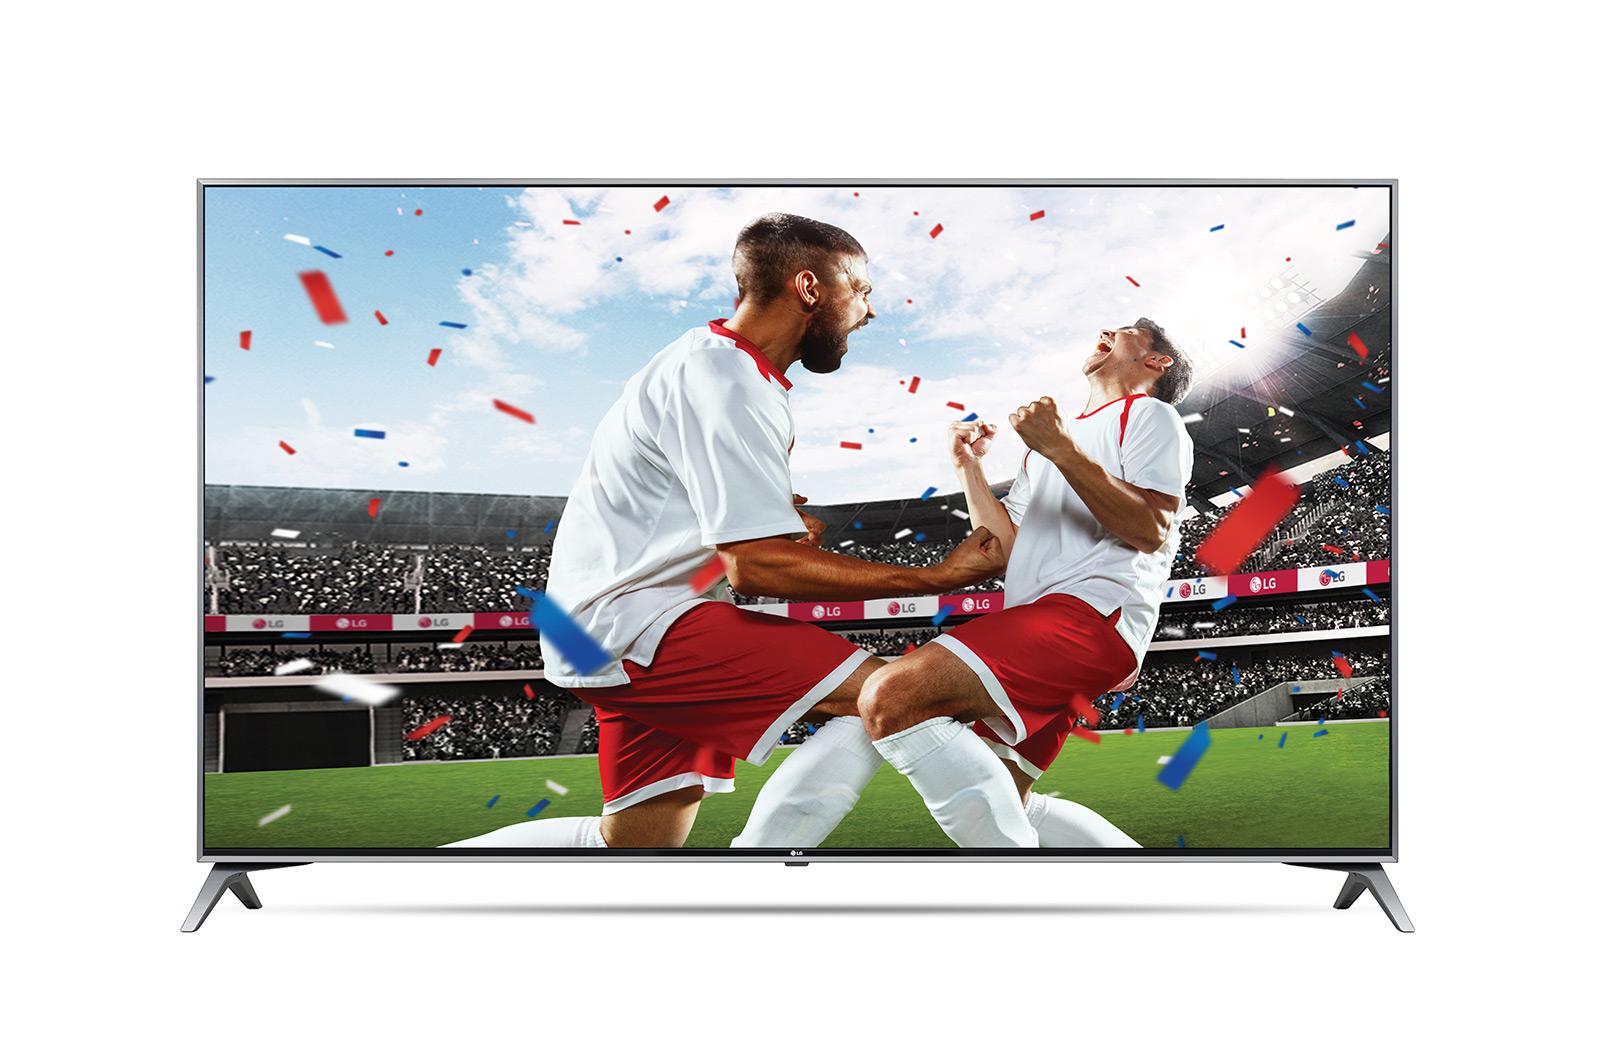 "LG 55SK7900 SMART LED TV 55"" (139cm) Super UHD"